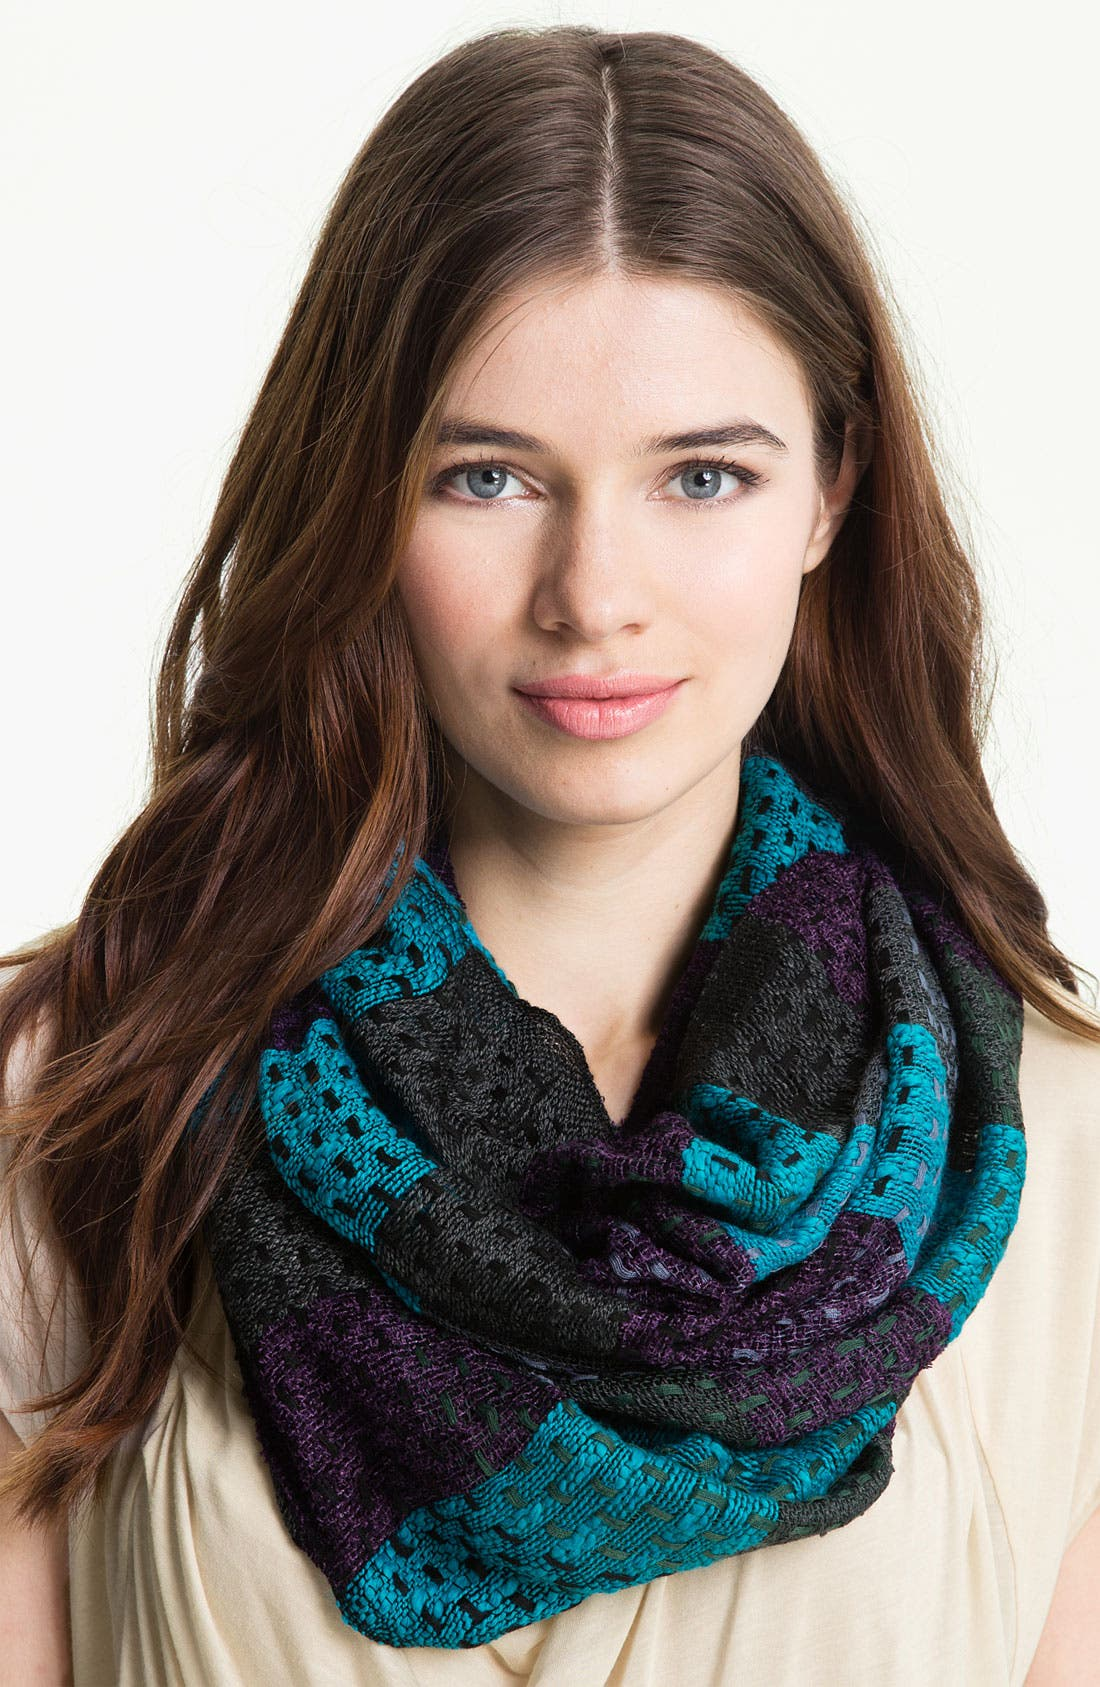 Main Image - Brazen Checkered Stitched Yarn Infinity Scarf